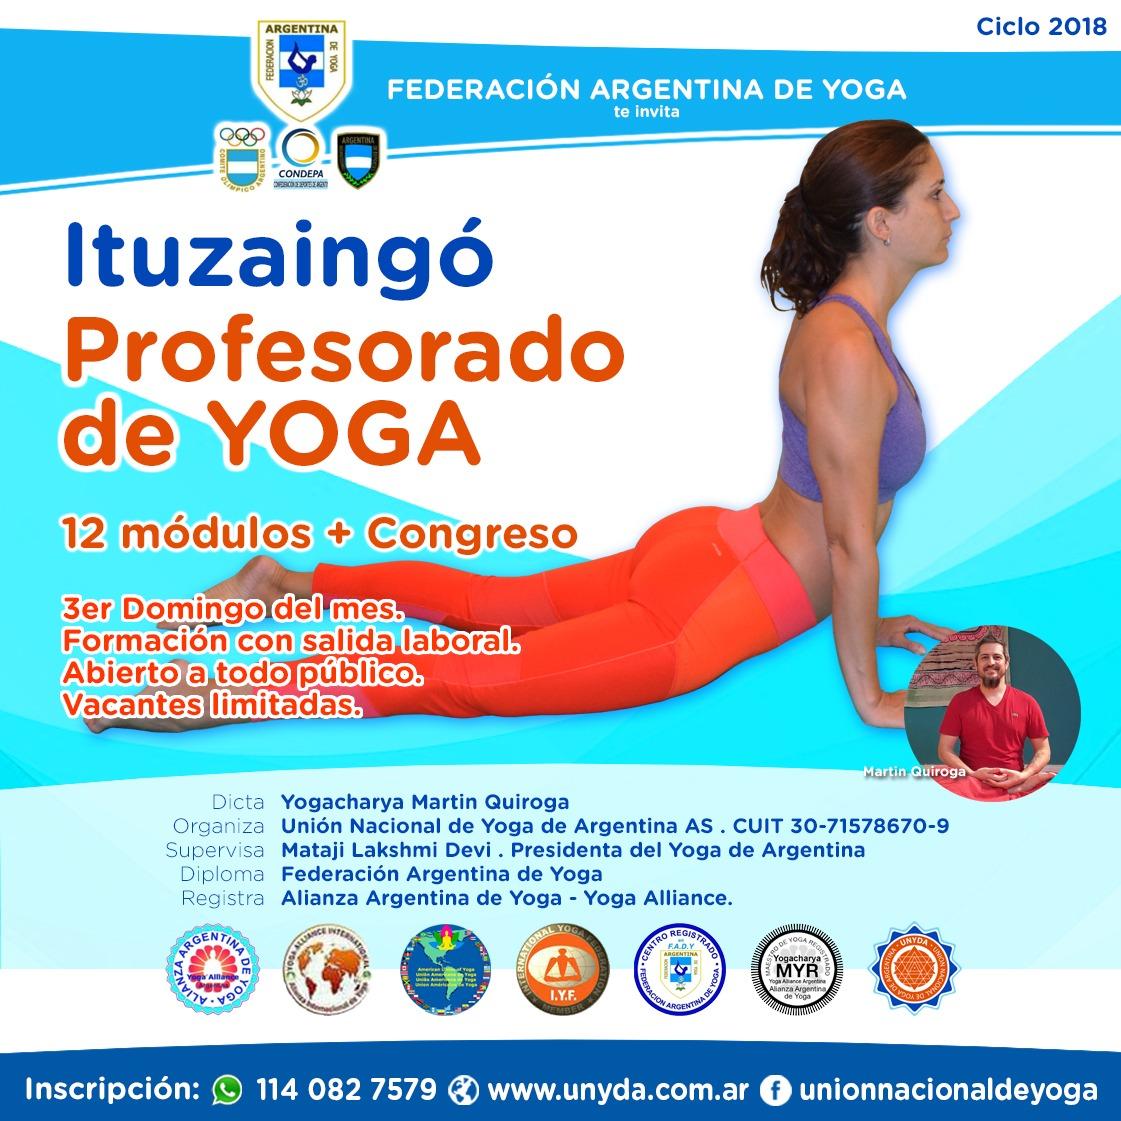 Profesorado de Yoga en Ituzaingó